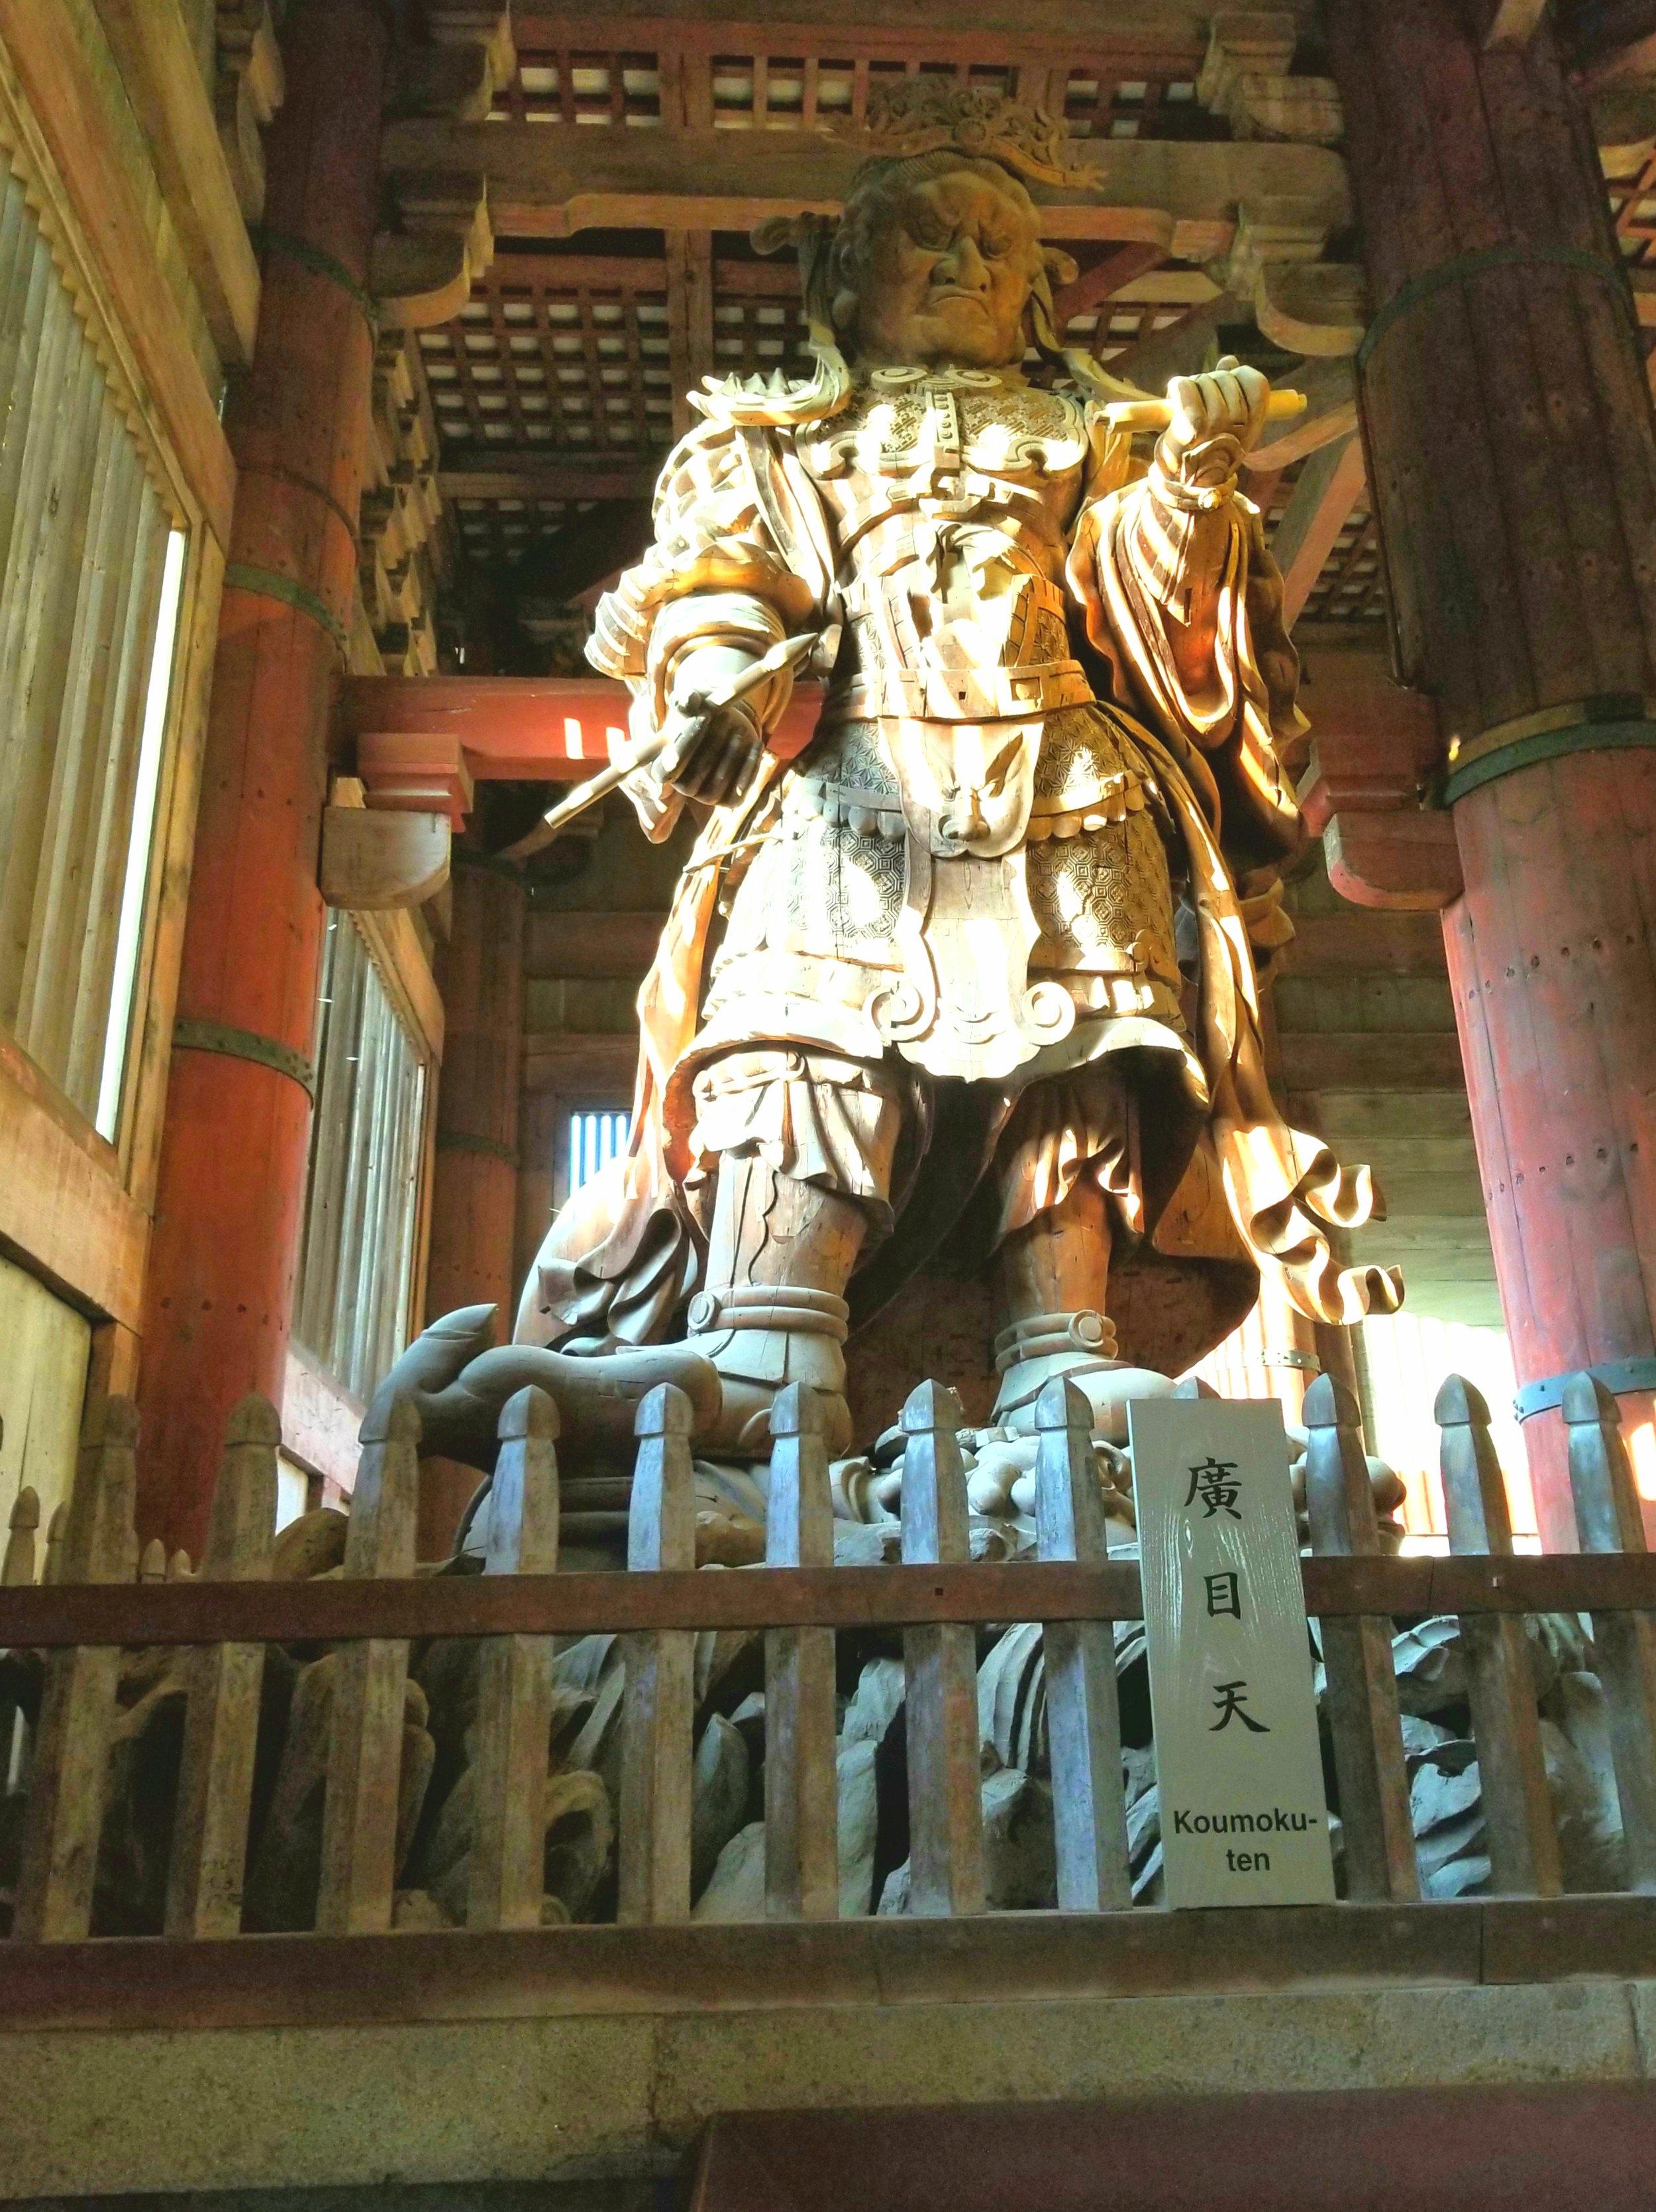 uprotoed-traveler-big-buddha-hall-vegan-guide-kyoto-todai-jo-temple-nara